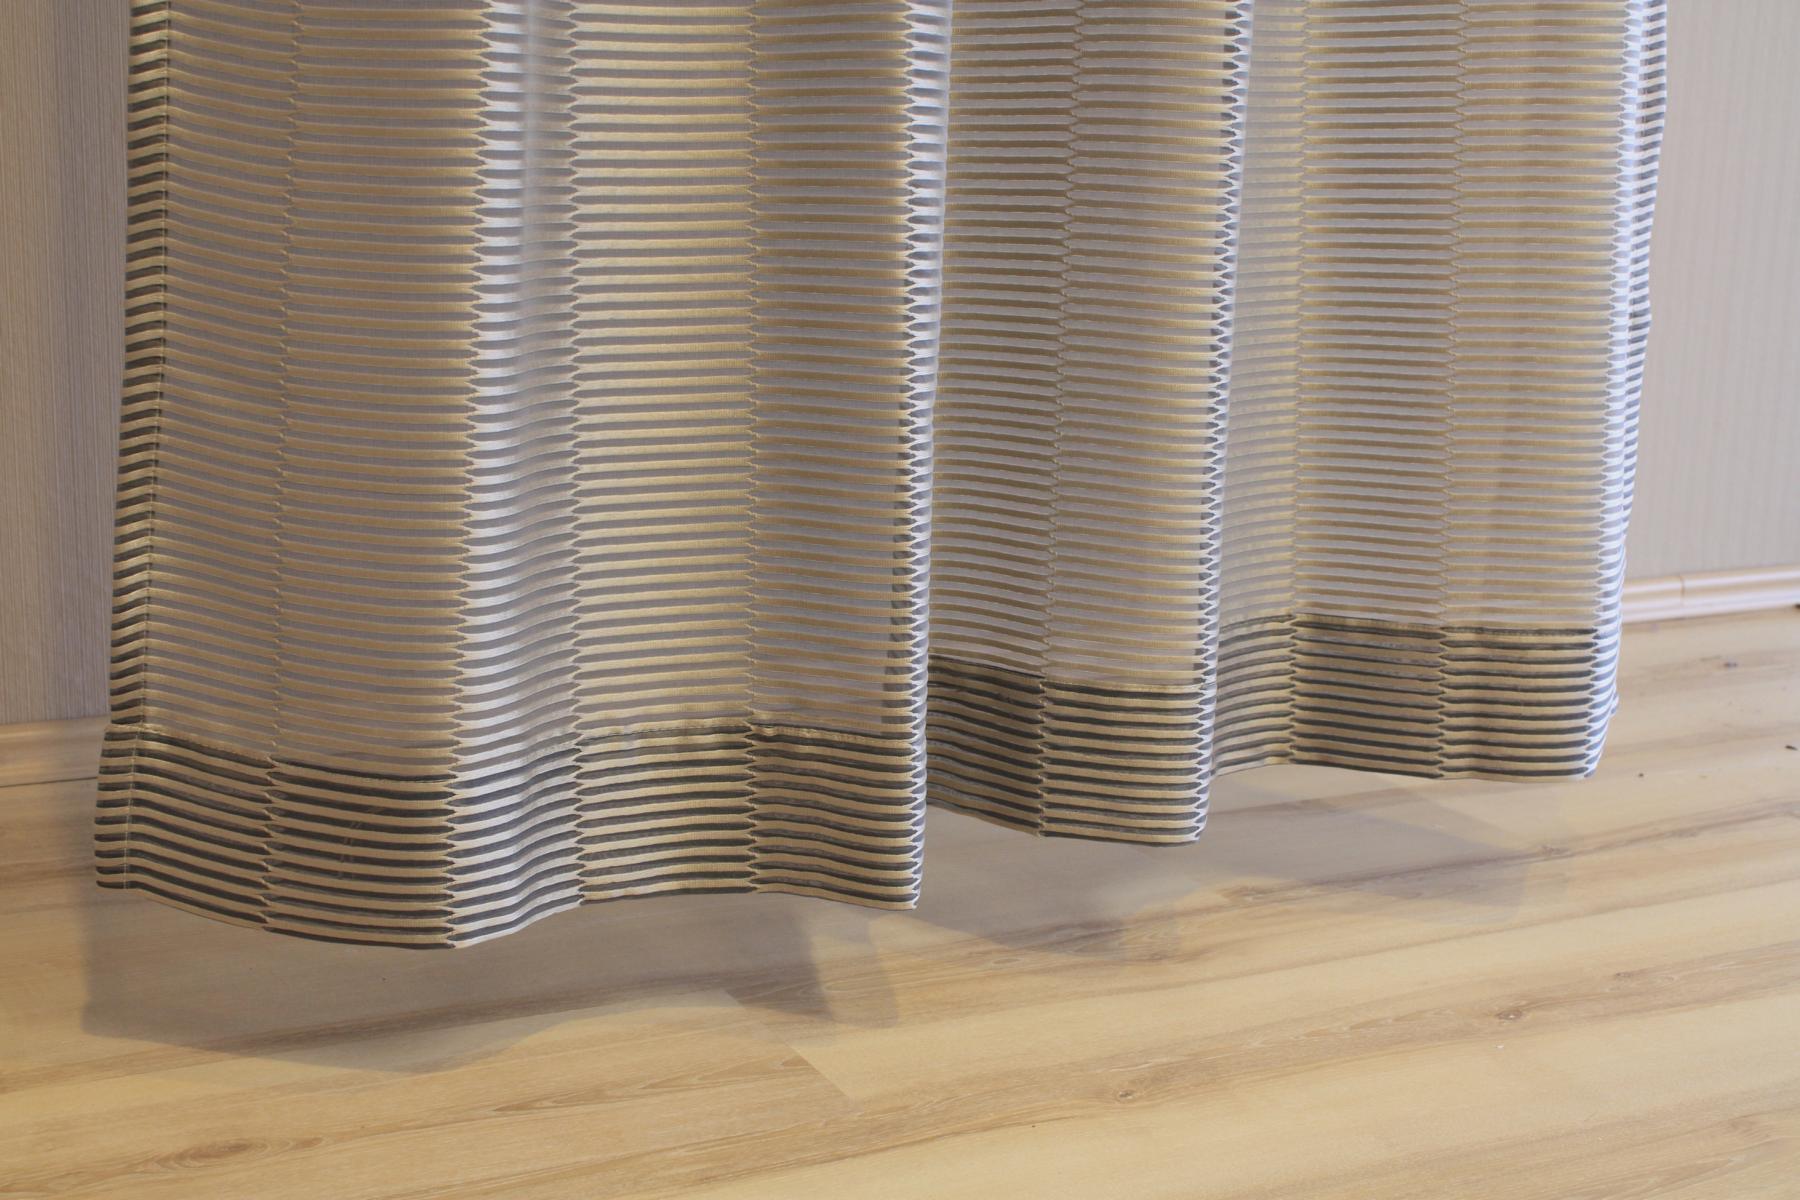 joop gardine vorhang senschal flesh 020 braun 140x250 cm fertigschal ebay. Black Bedroom Furniture Sets. Home Design Ideas